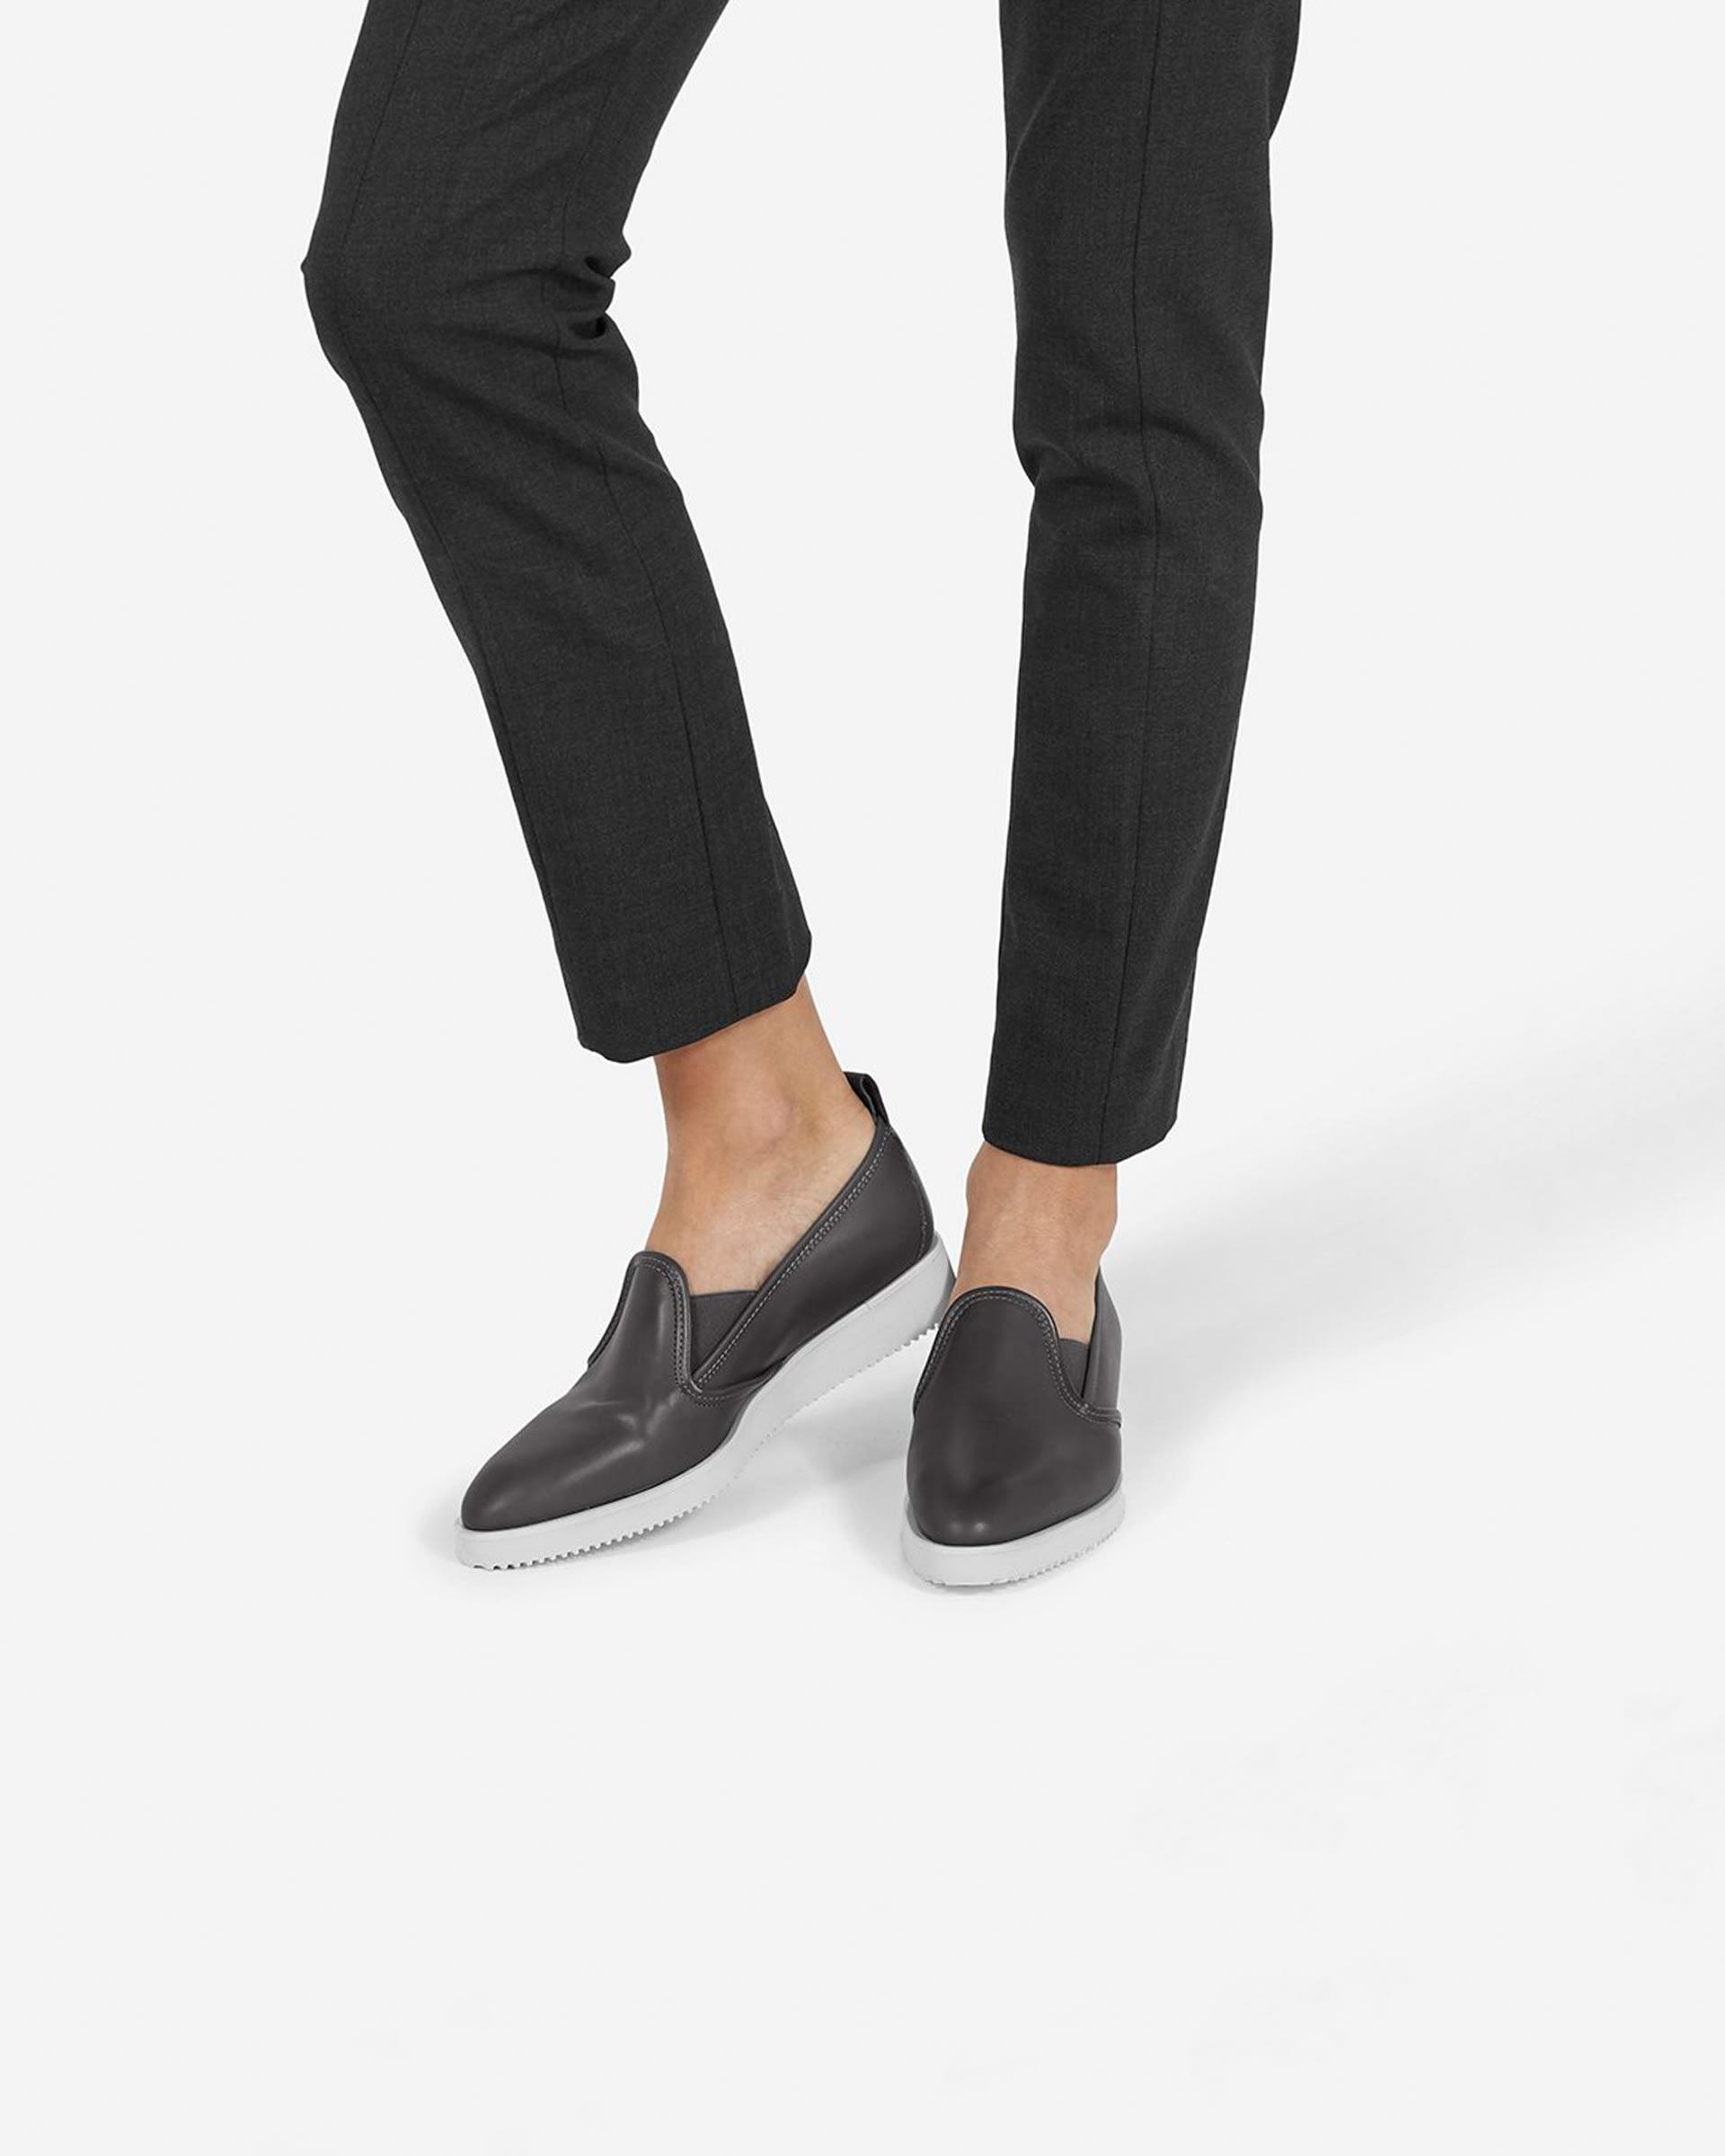 The Leather Street Shoe – Everlane